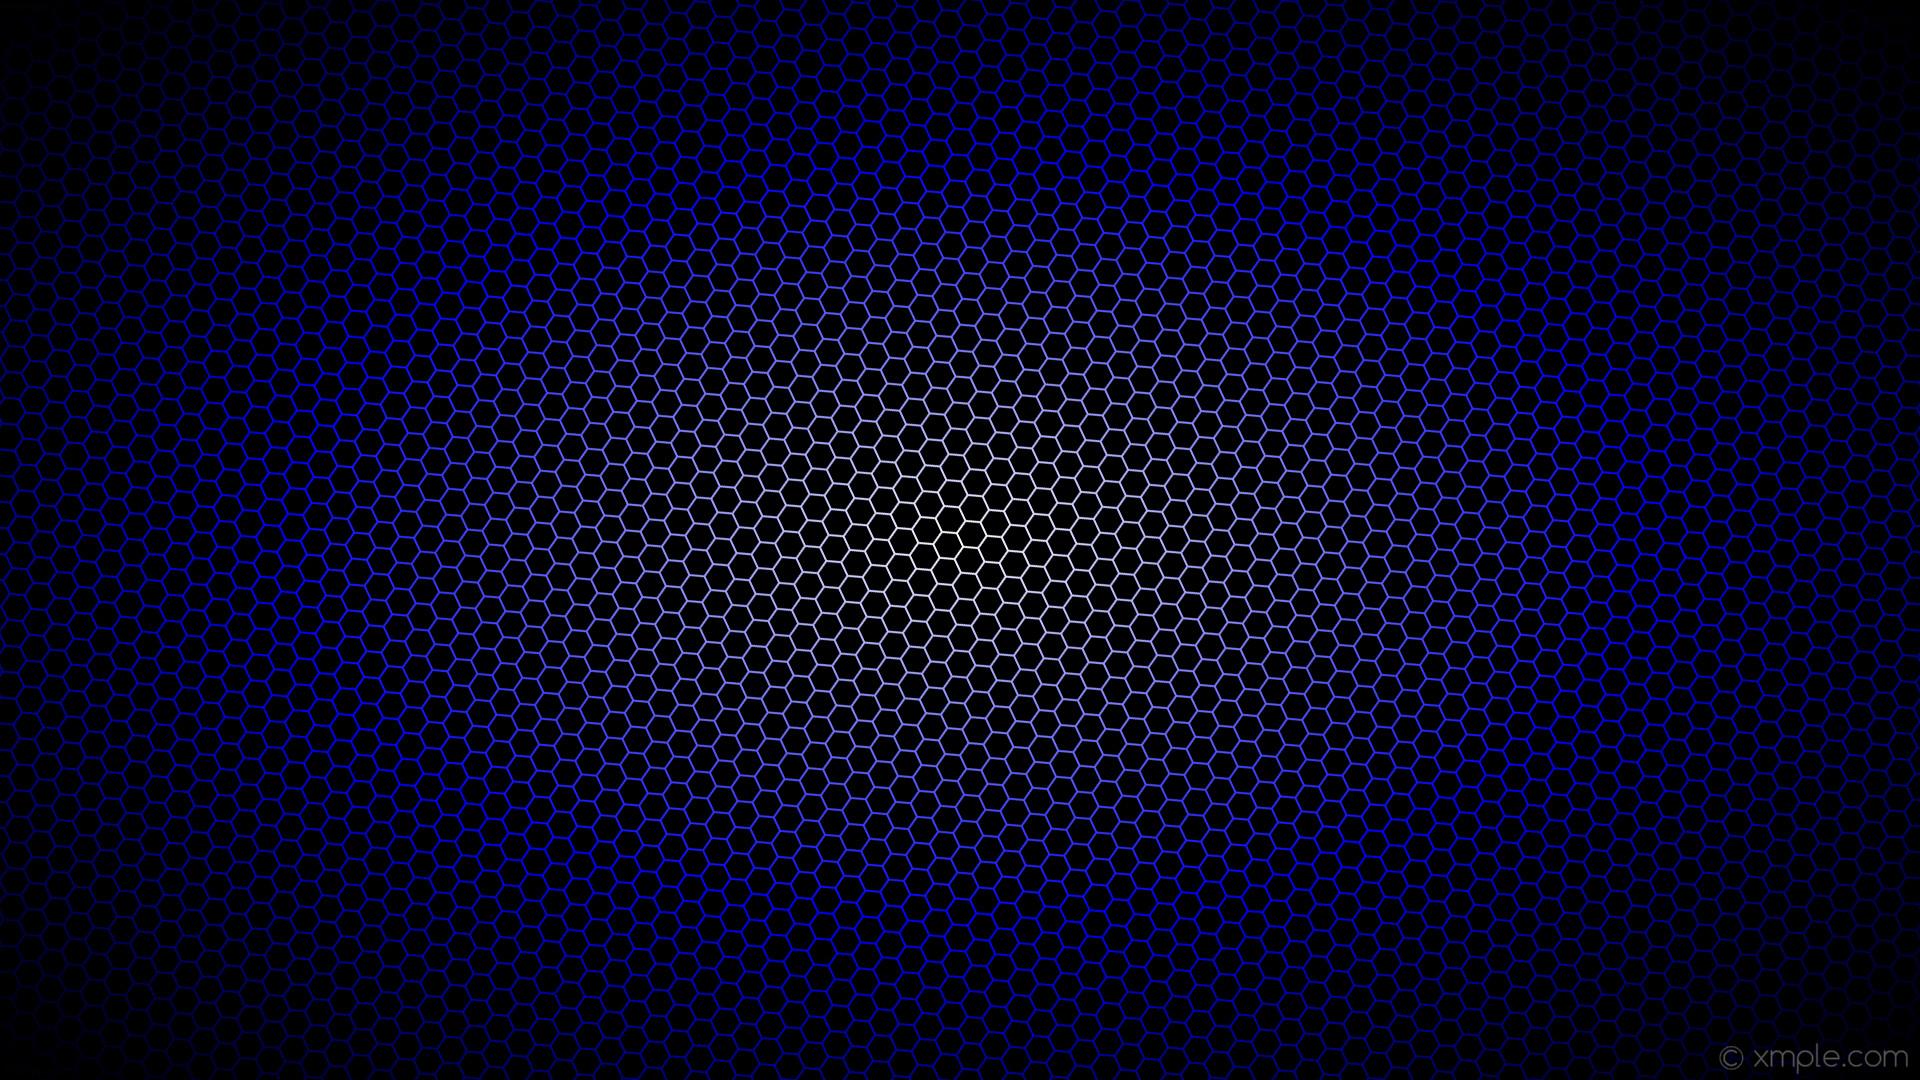 wallpaper blue hexagon glow white gradient black #000000 #ffffff #0000ff  diagonal 25°